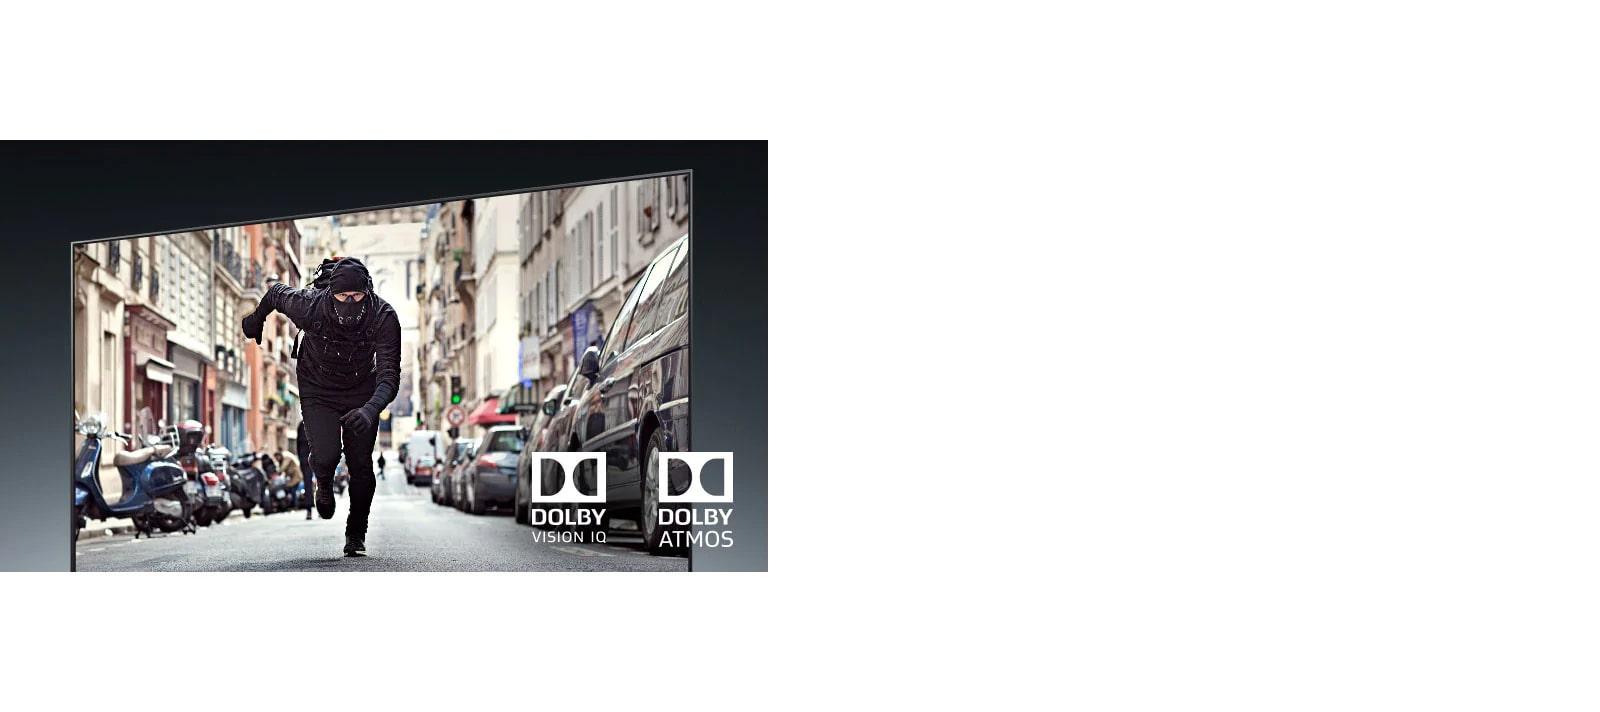 Enjoy professionally mastered visual and sound1